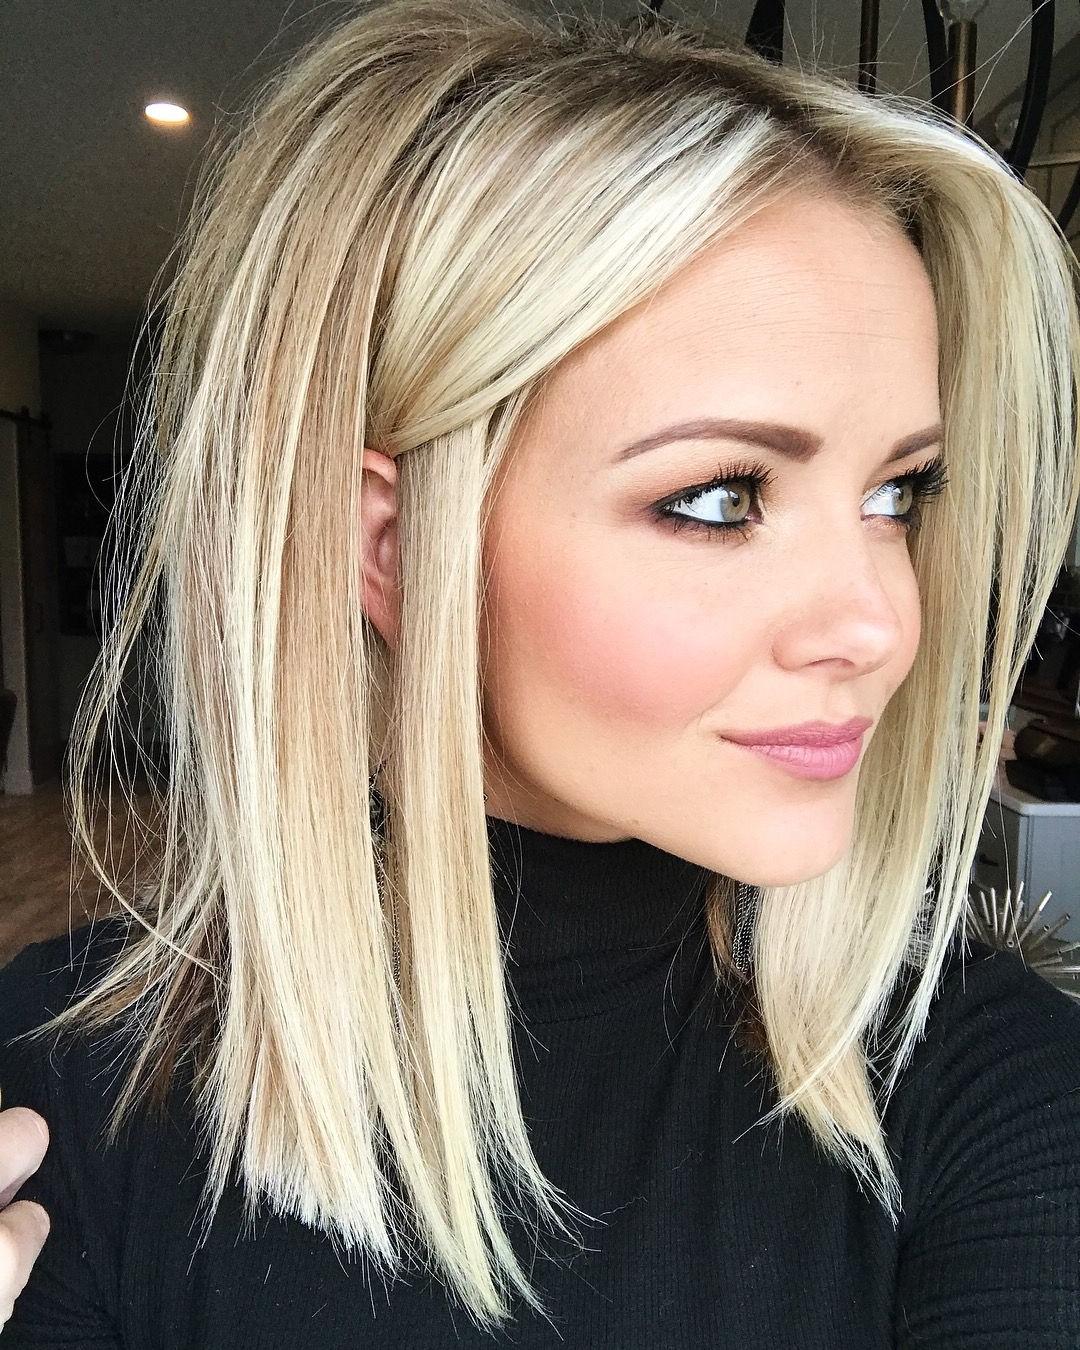 Blonde Lob Haircut (View 12 of 20)